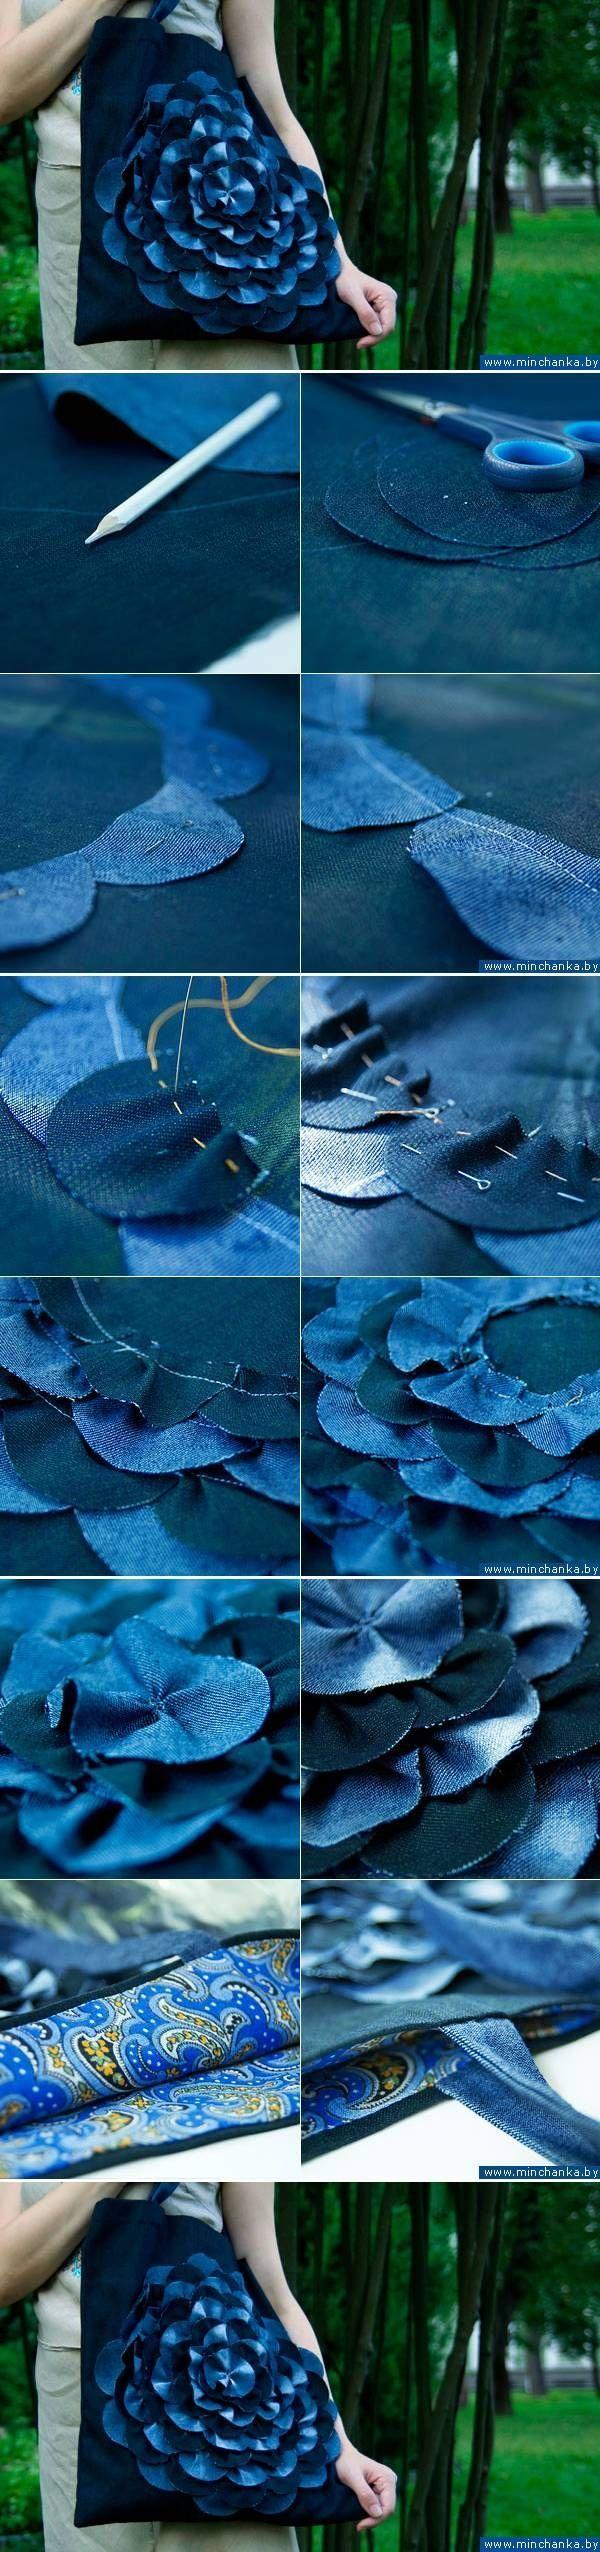 DIY Denim Flower Bag fashion flower denim. Great photo tutorial for upcycling denim.